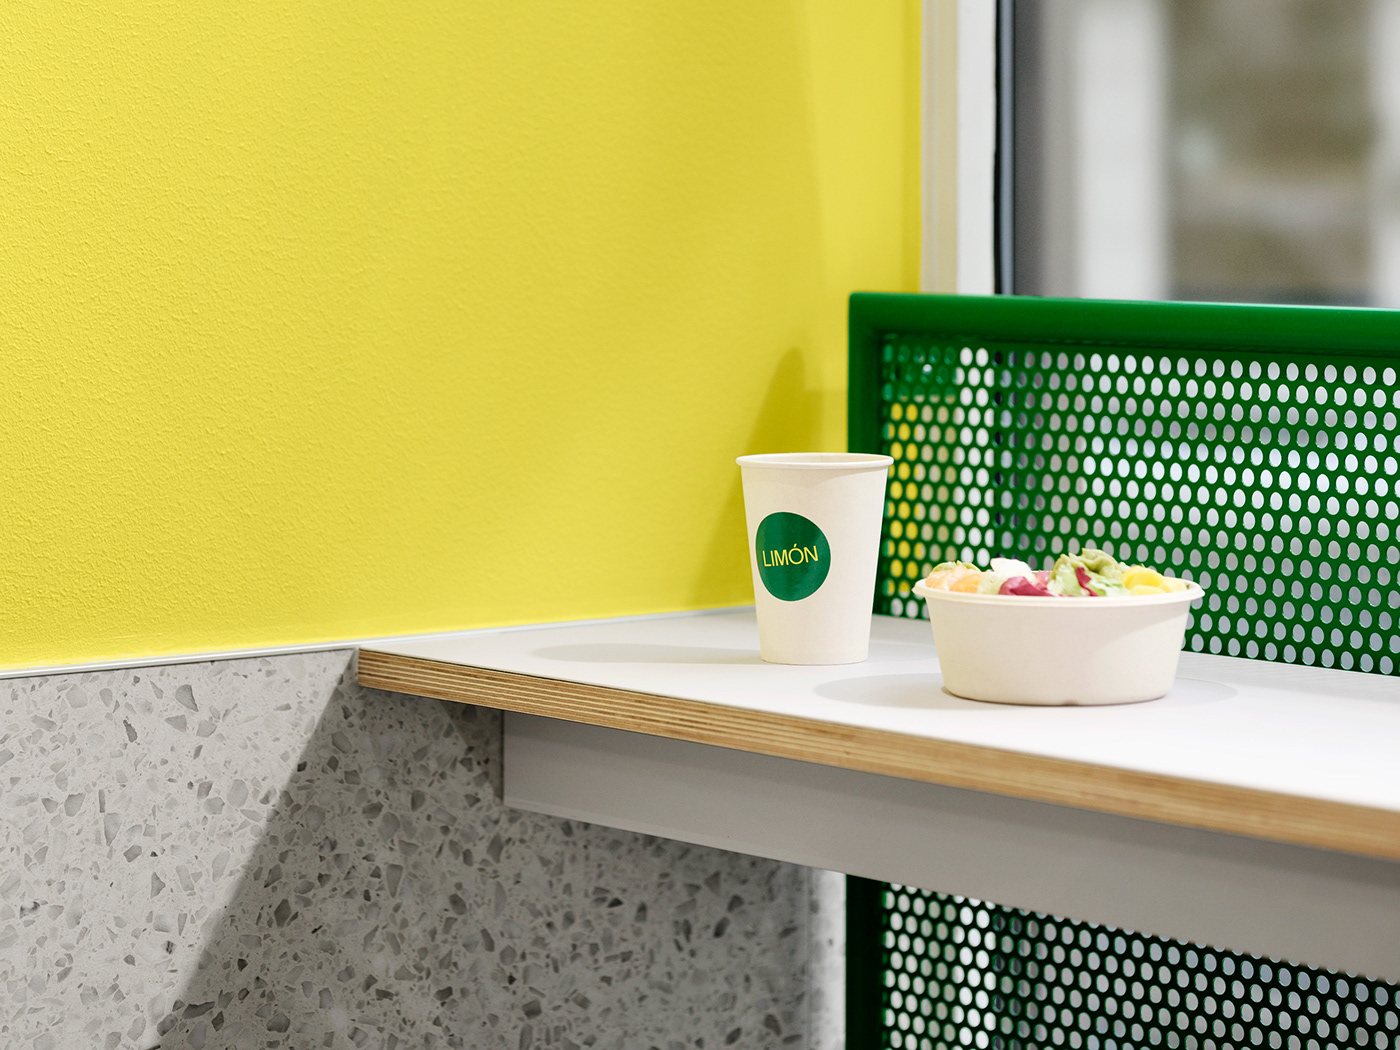 Ceviche,fastfood,fresh,identity,Packaging,poke,restaurant,Retail